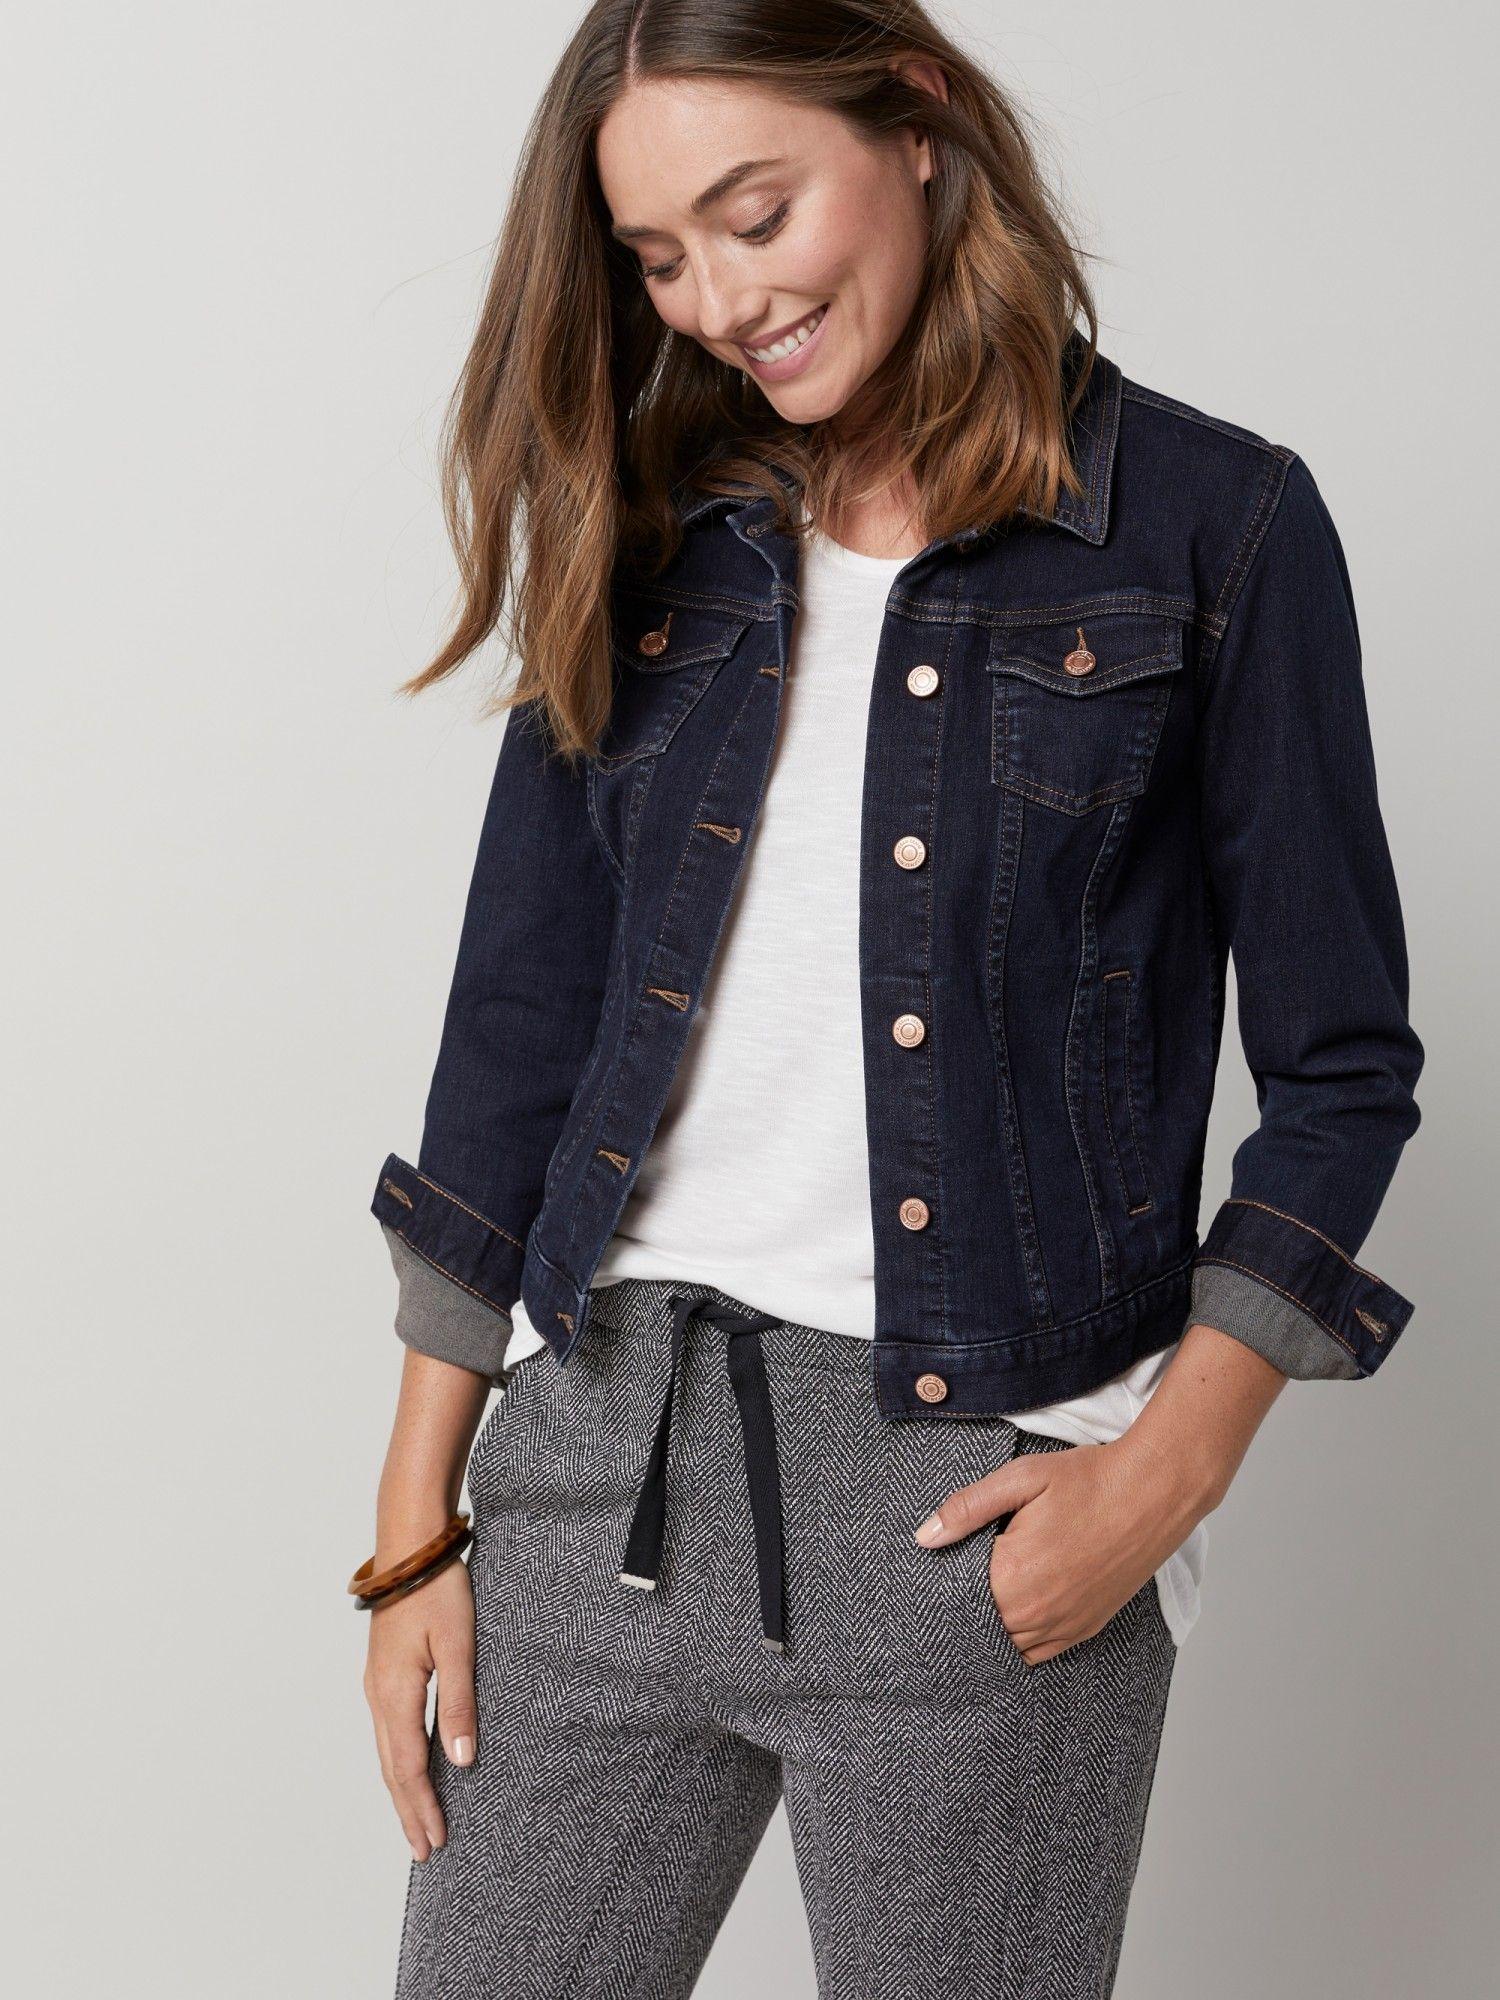 Lookbook Feb 2019 Look 11 Dark Denim Jacket Fashion Dark Denim Jacket Outfit [ 2000 x 1500 Pixel ]